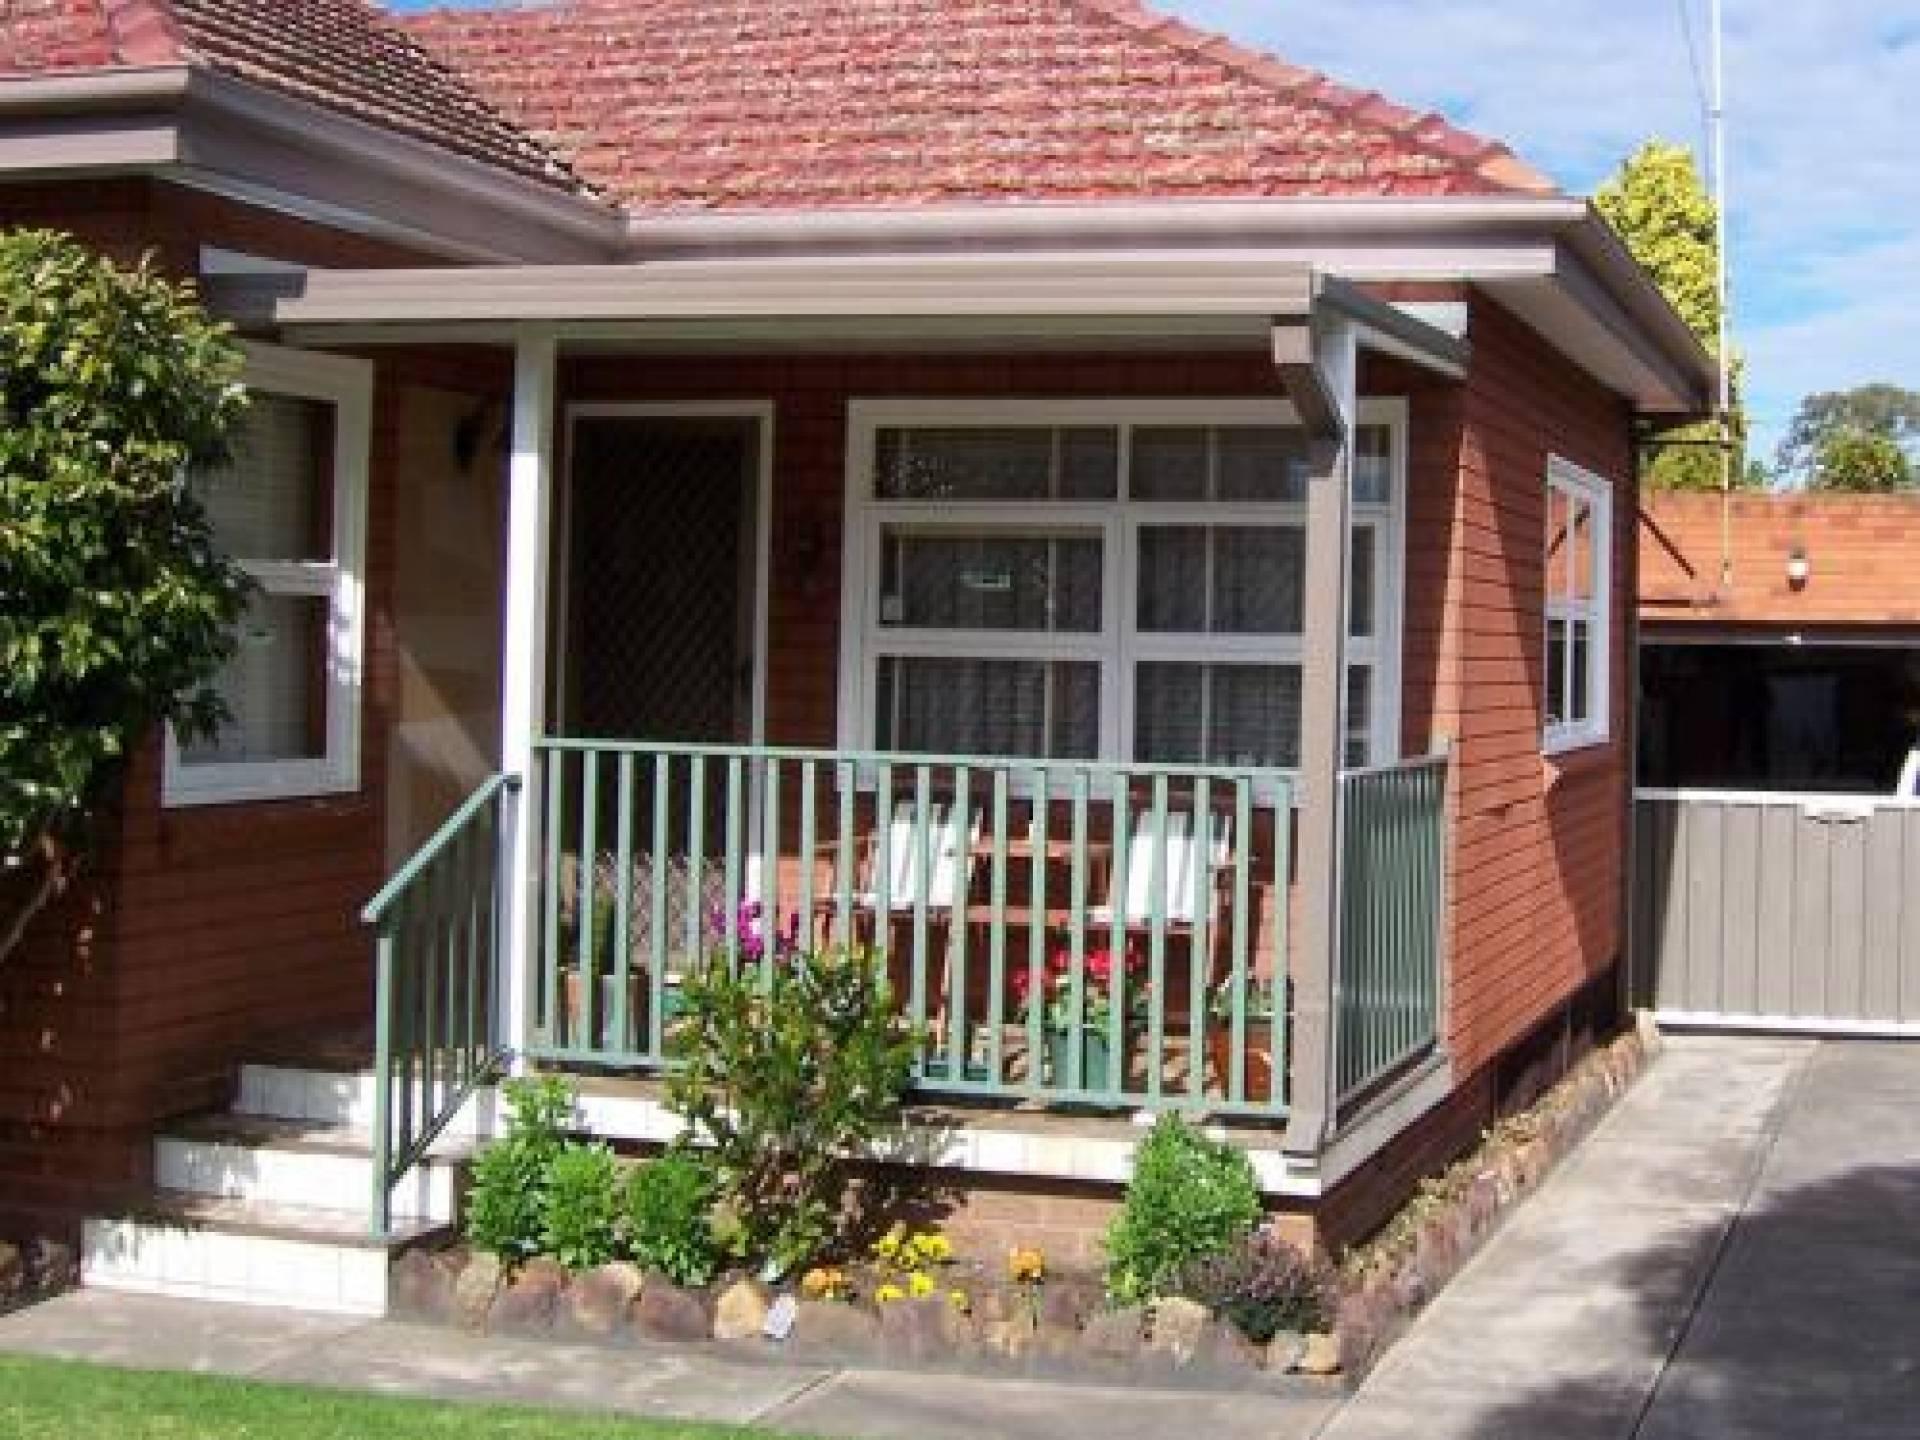 Wrought Iron Small Front Veranda Fence Design House Home Plans Blueprints 13746